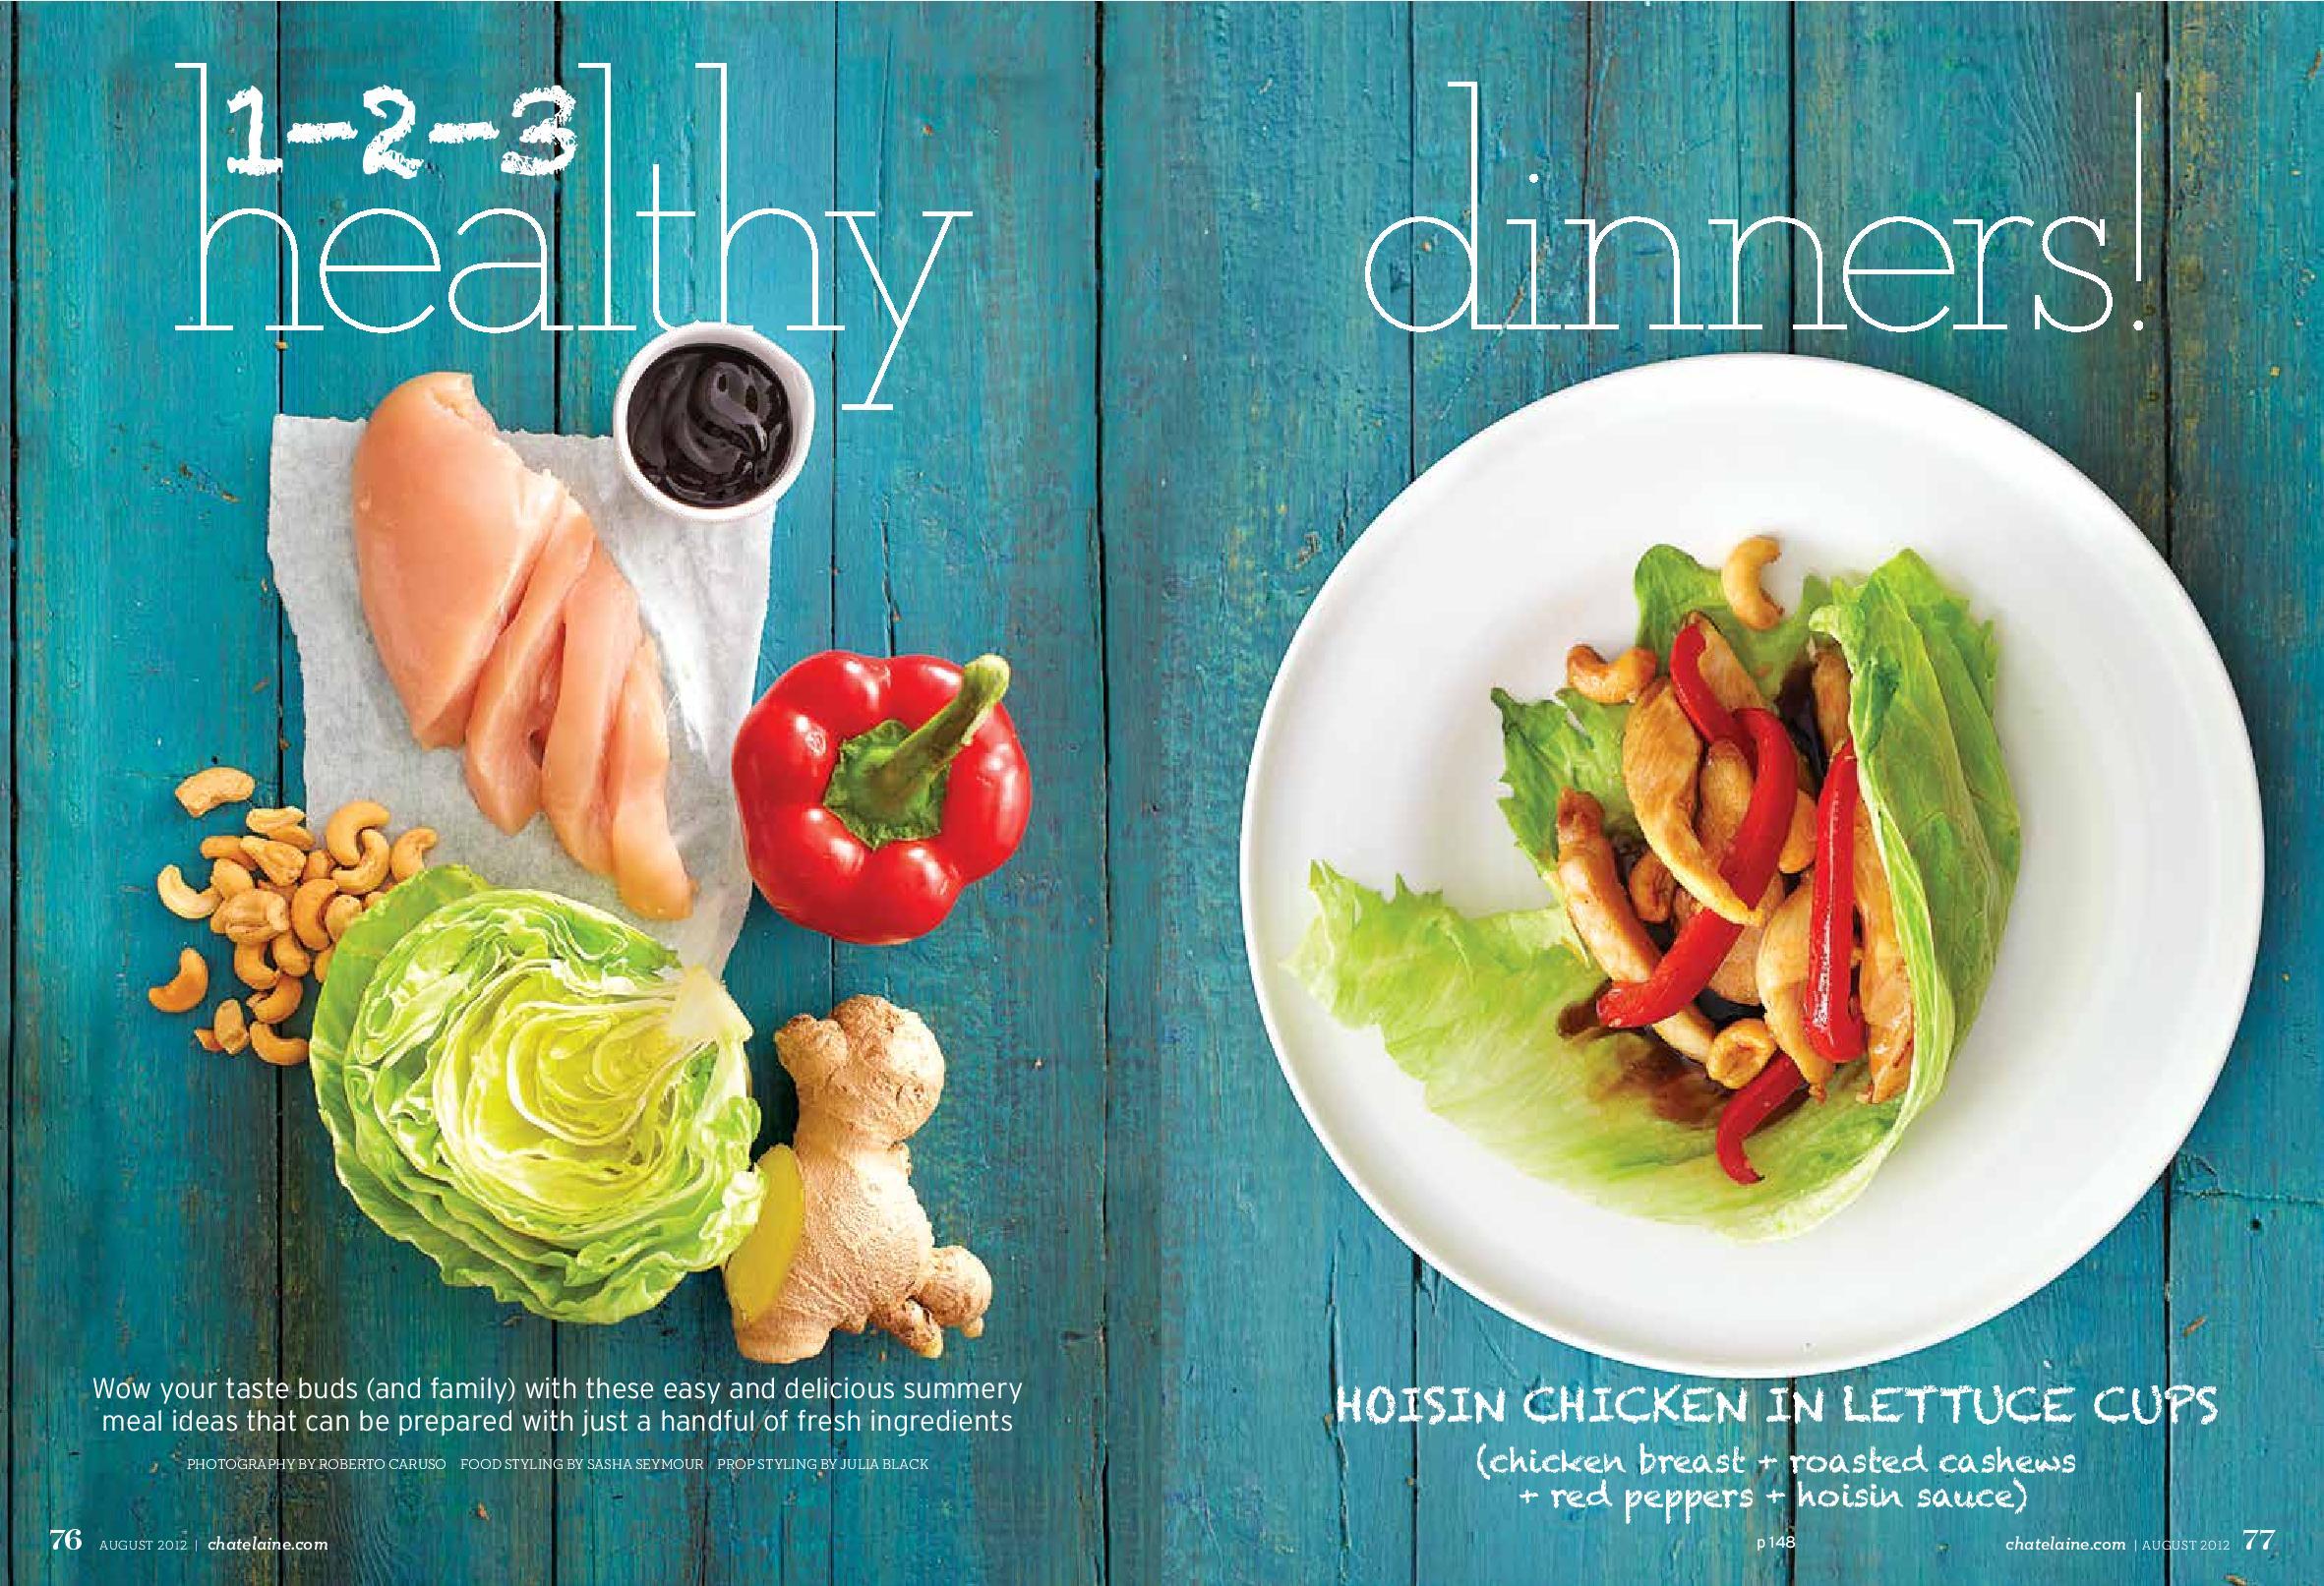 healthy dinner 123 aug 2012-page-001.jpg